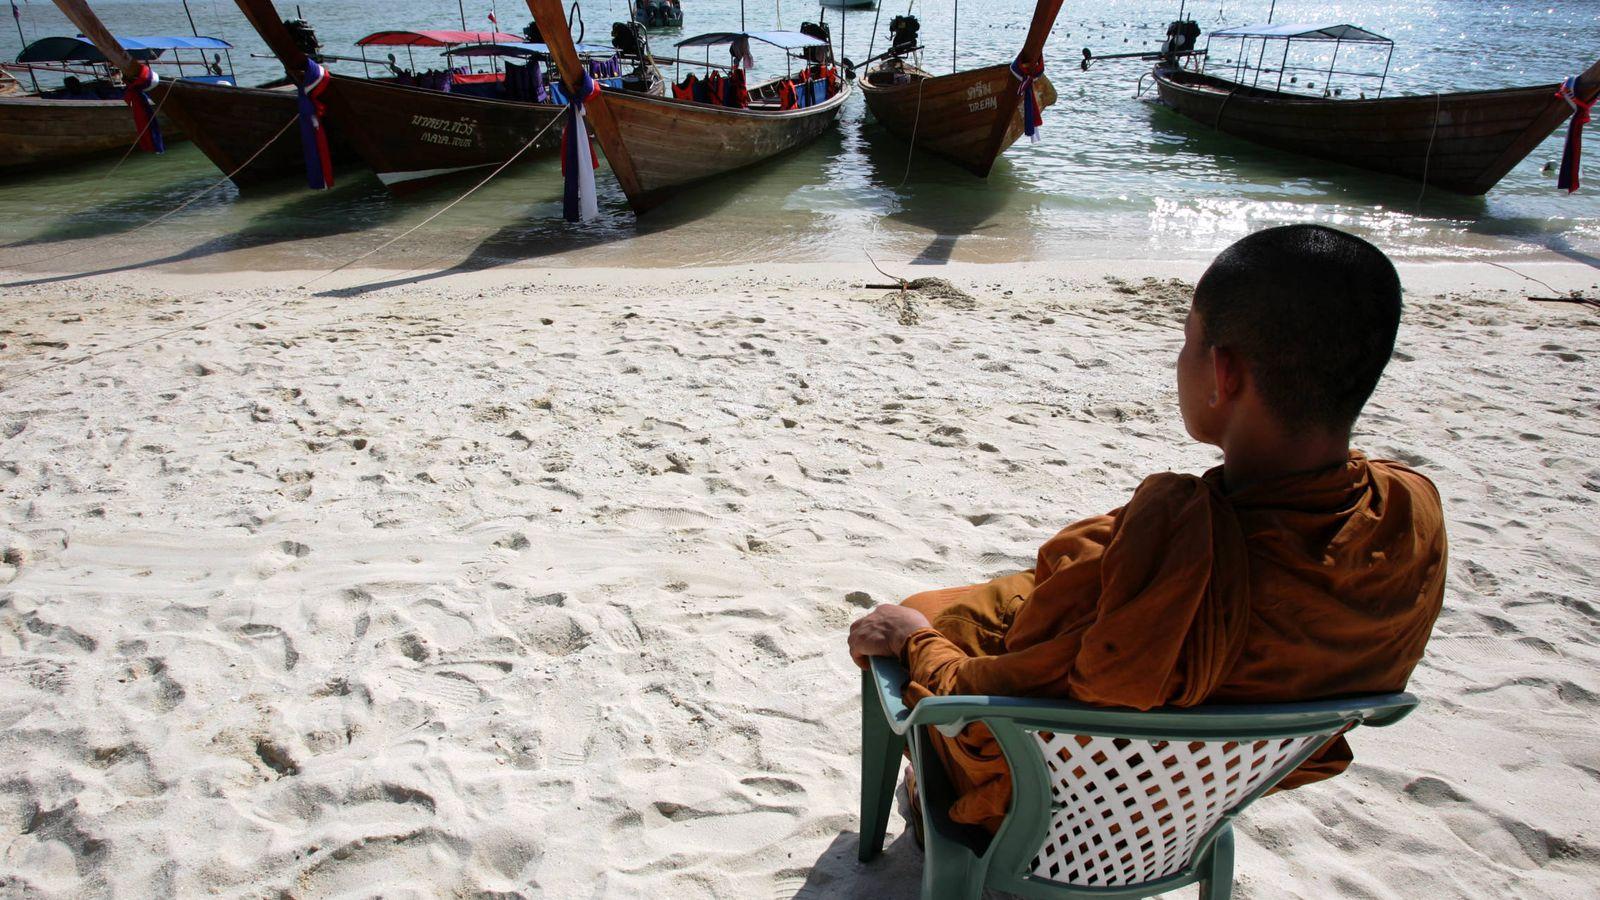 Foto: Un monje budista bendice las barcas de pesca, en el archipiélago de Phi Phi, Tailandia. (Reuters)